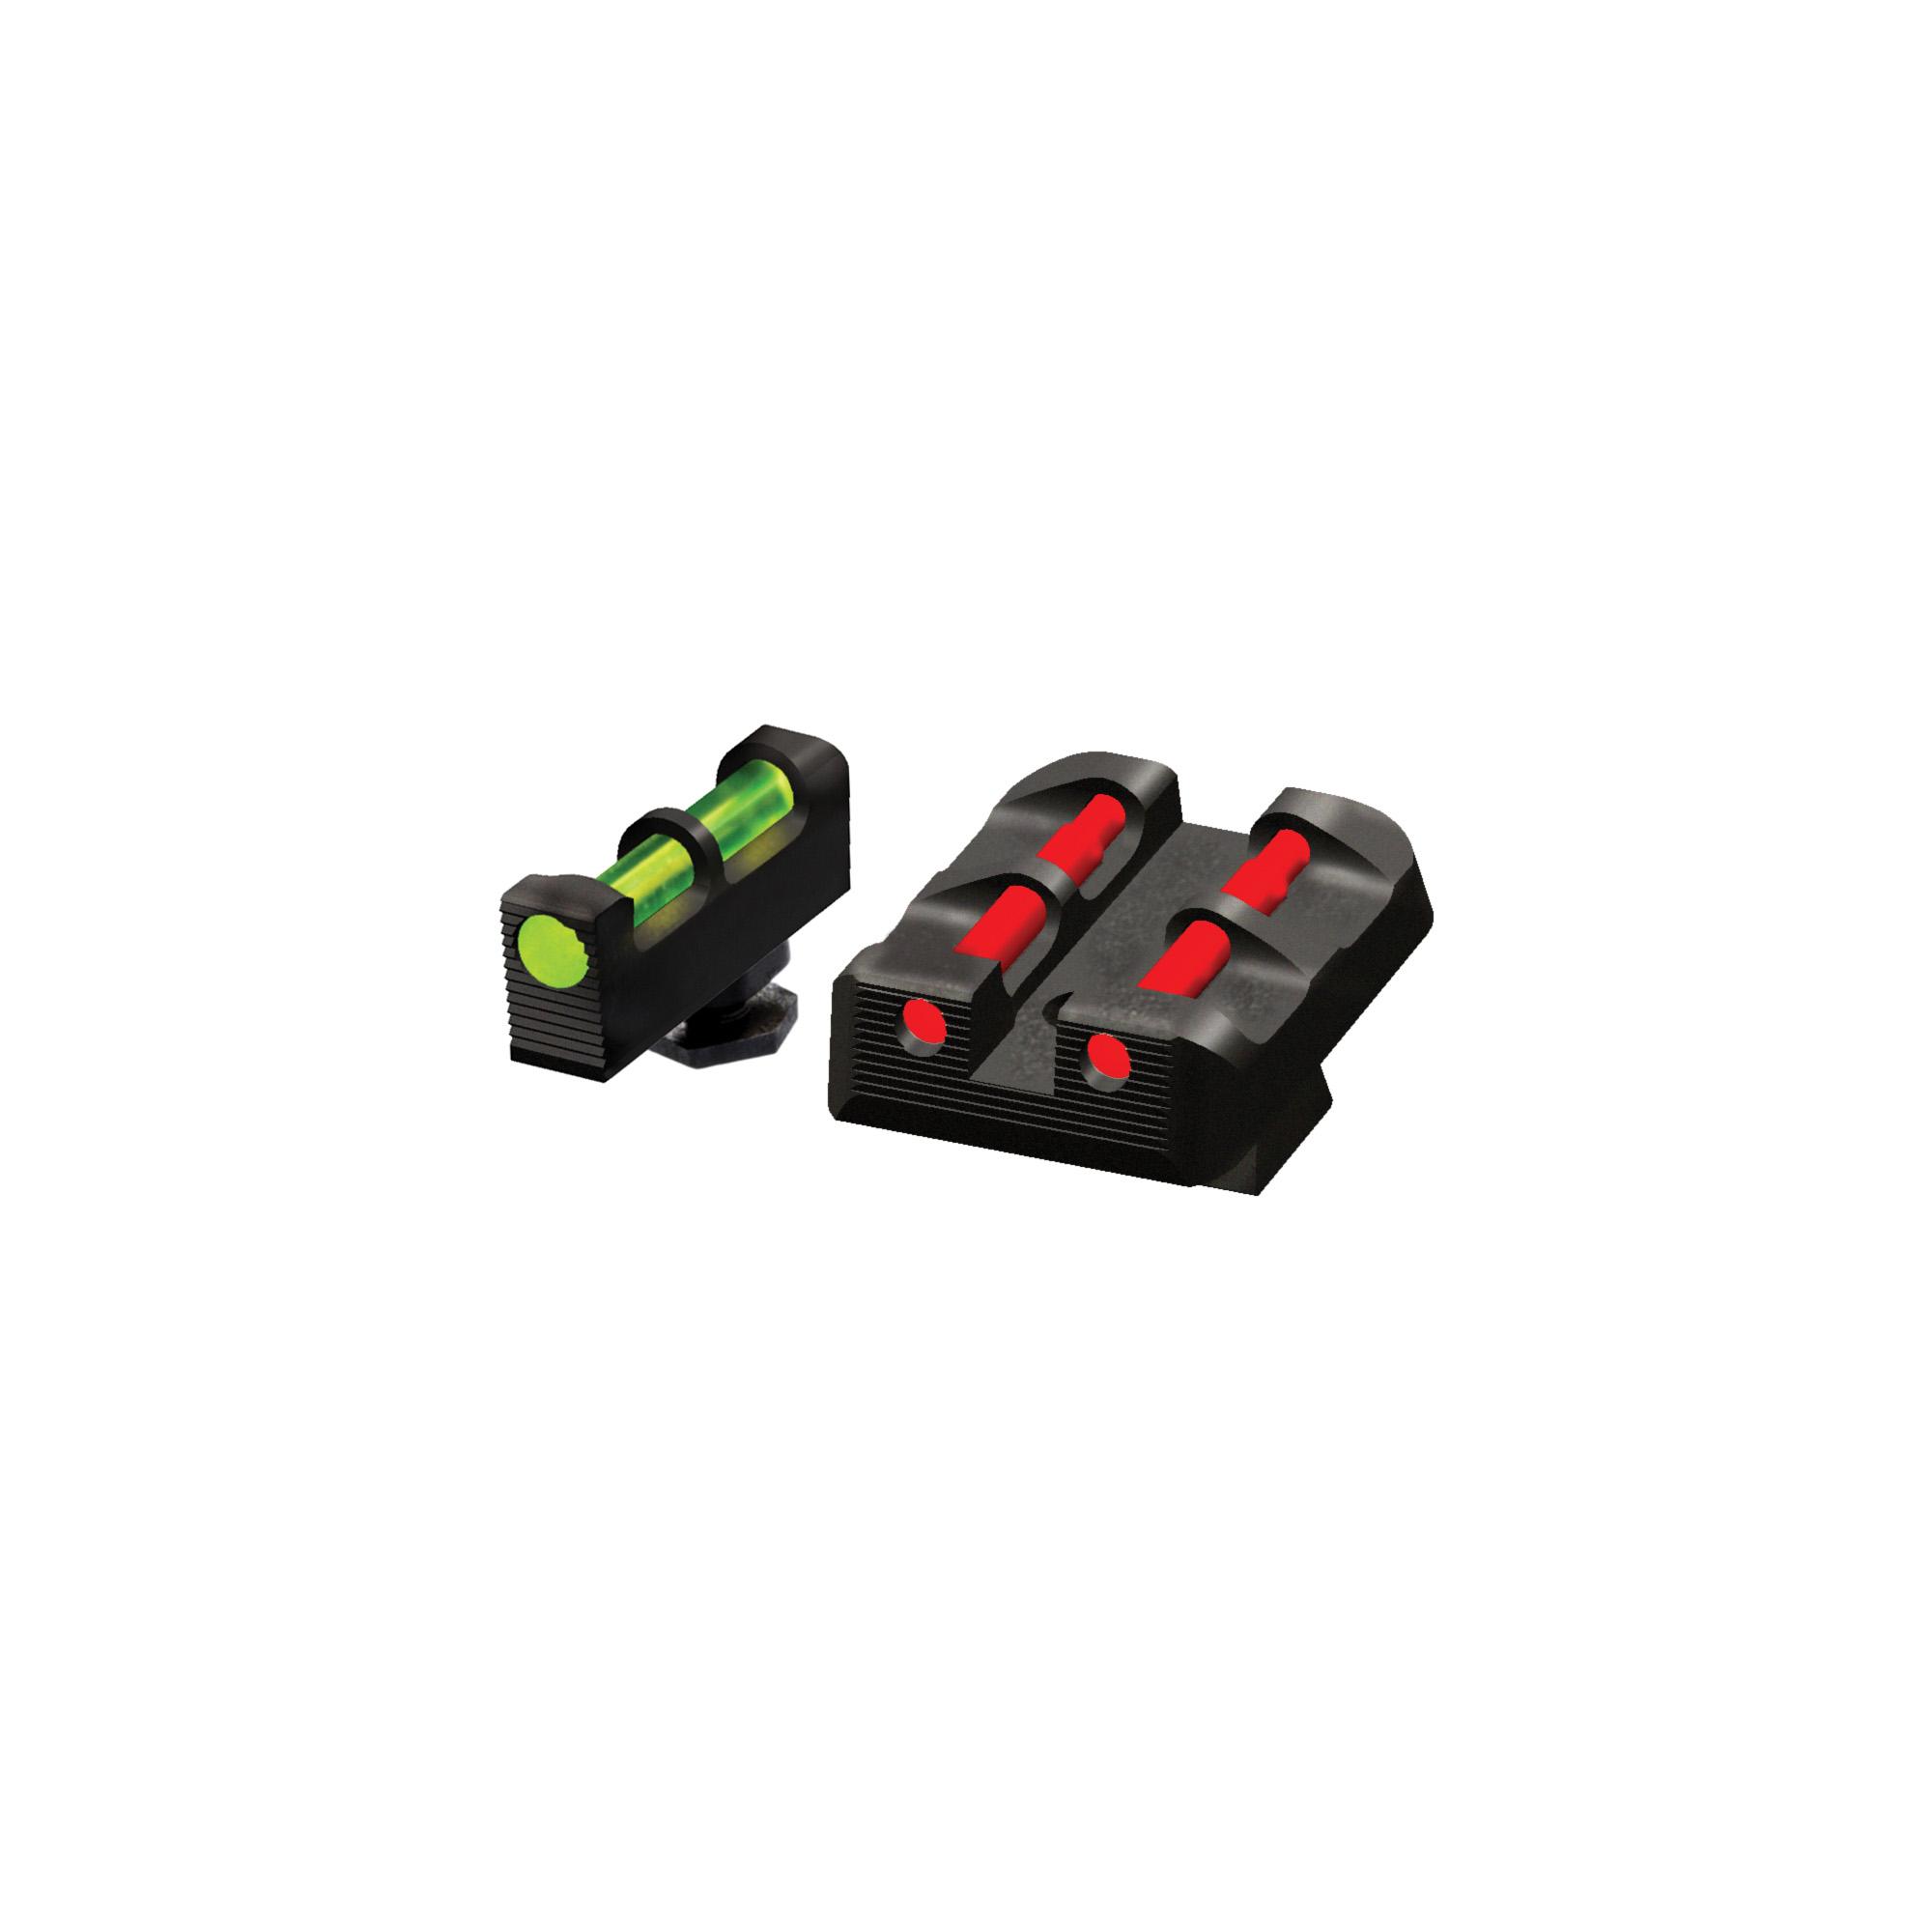 Hiviz Glock Interchange Sight Set